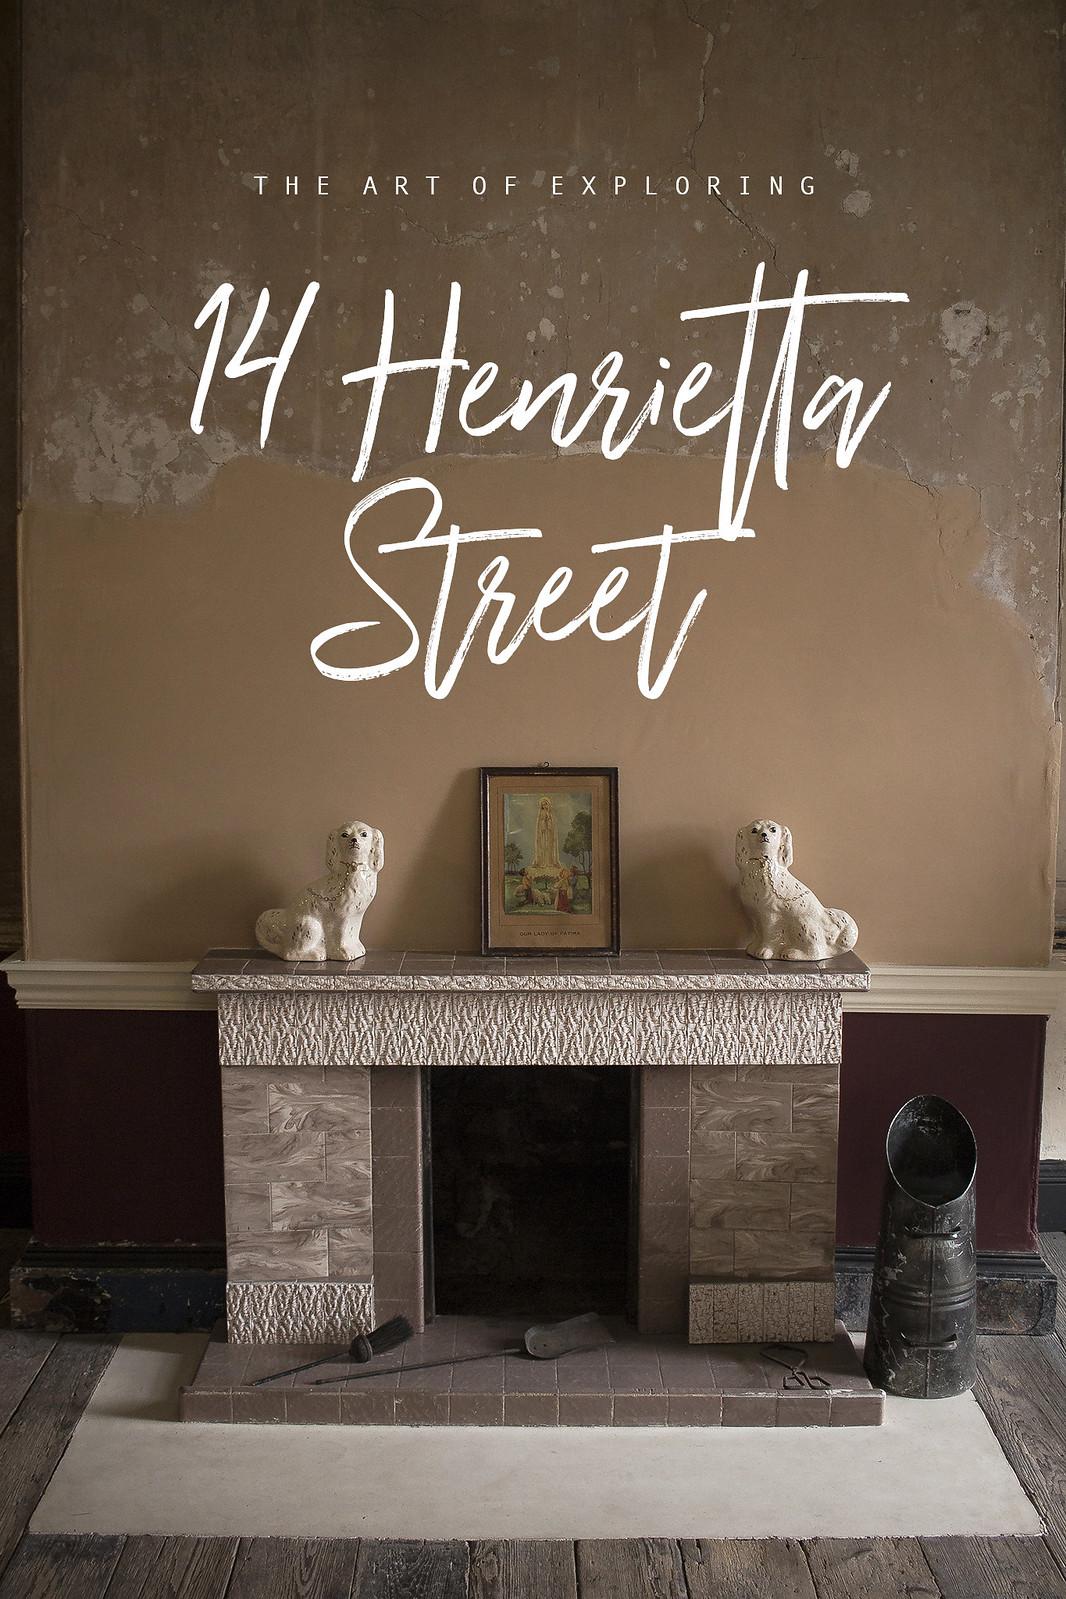 14 Henrietta Street Museum